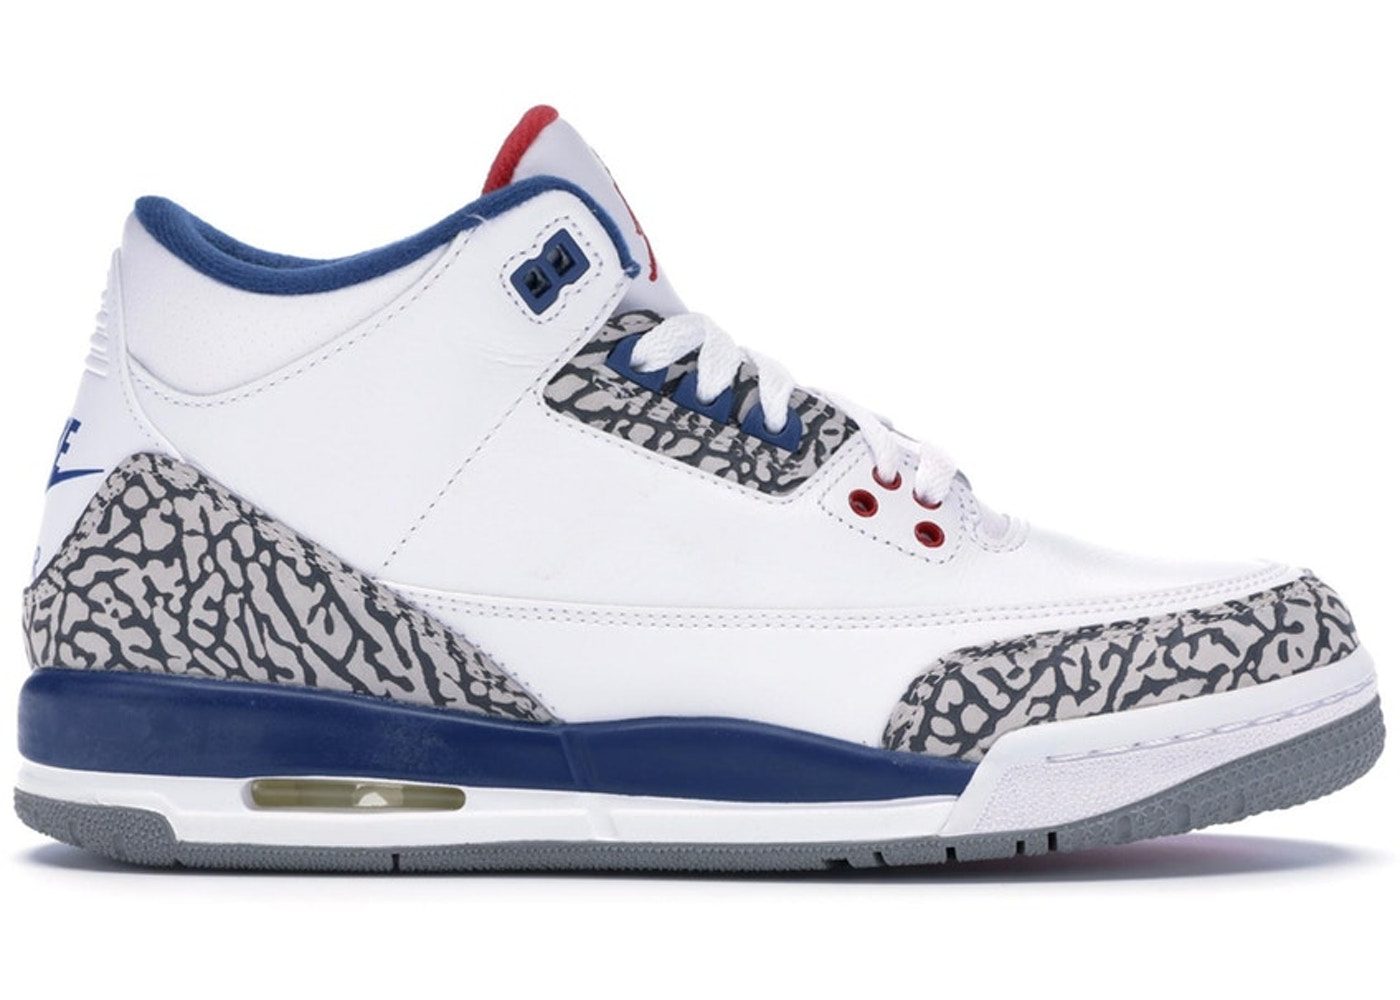 3cdb3b2bd9980 Buy Air Jordan 3 Shoes   Deadstock Sneakers